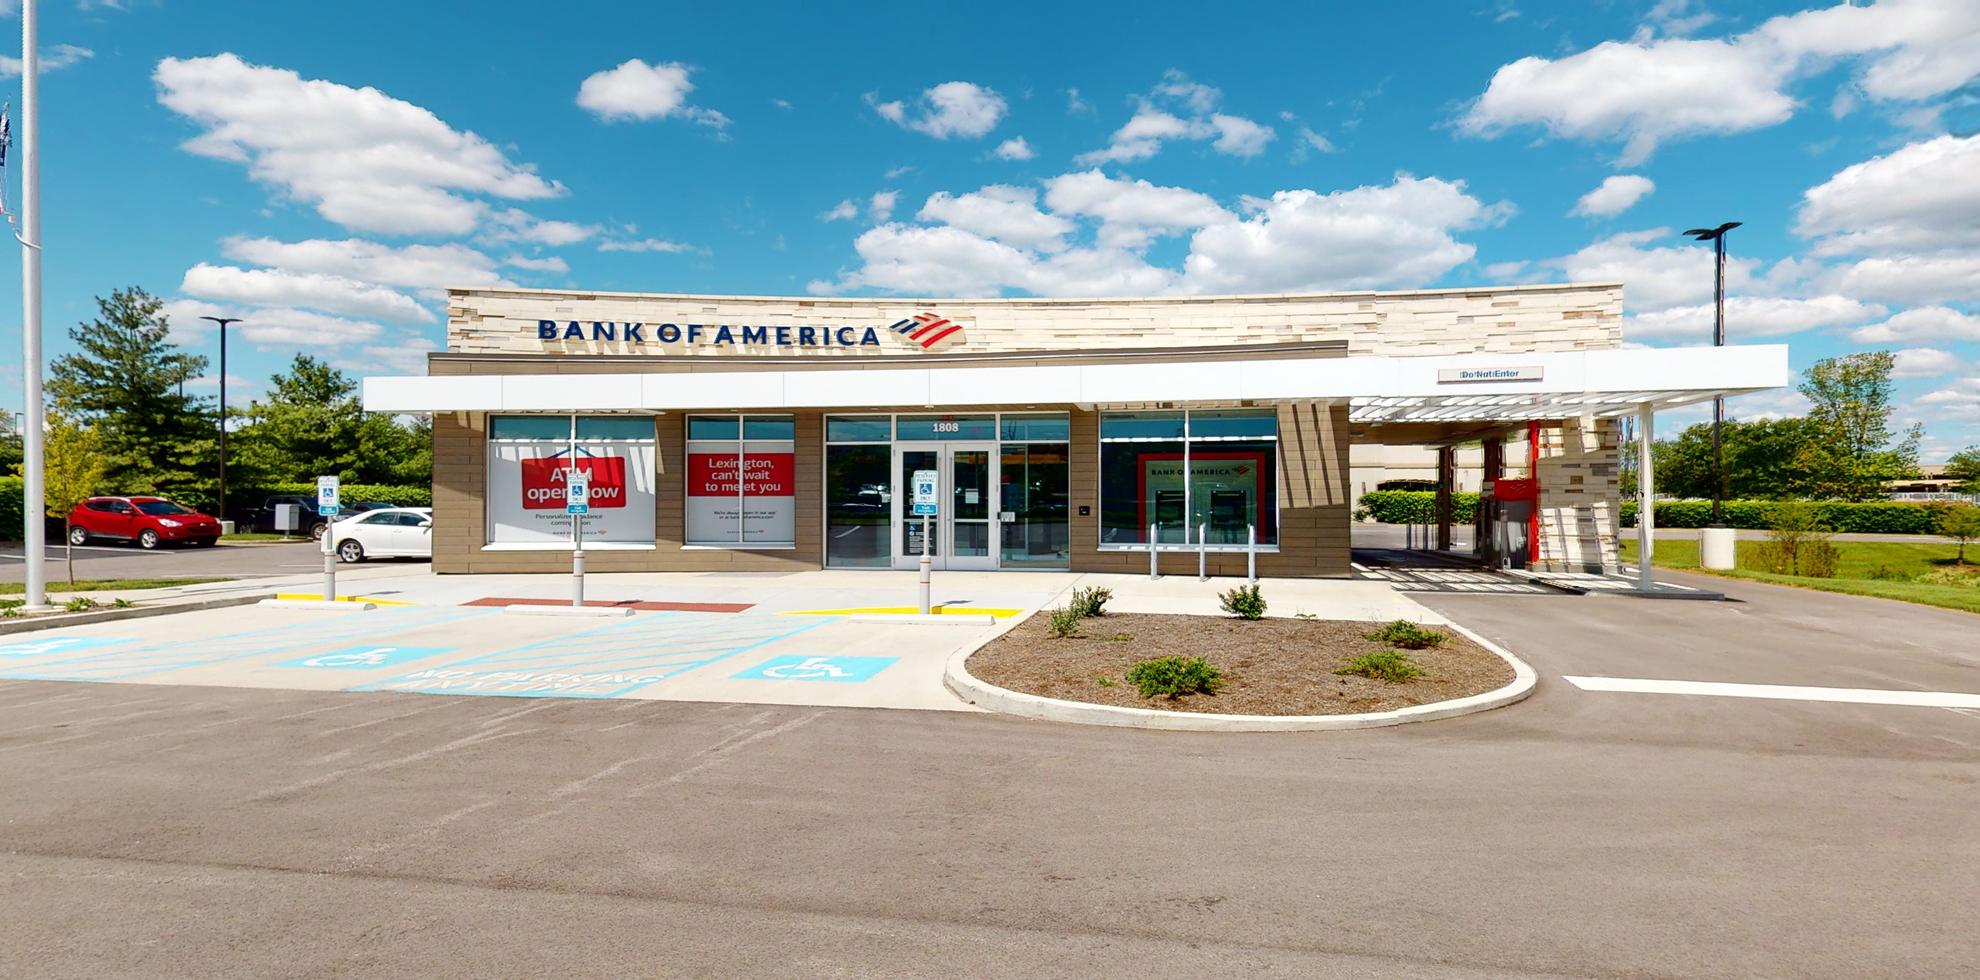 Bank of America financial center with drive-thru ATM | 1808 Alysheba Way, Lexington, KY 40509